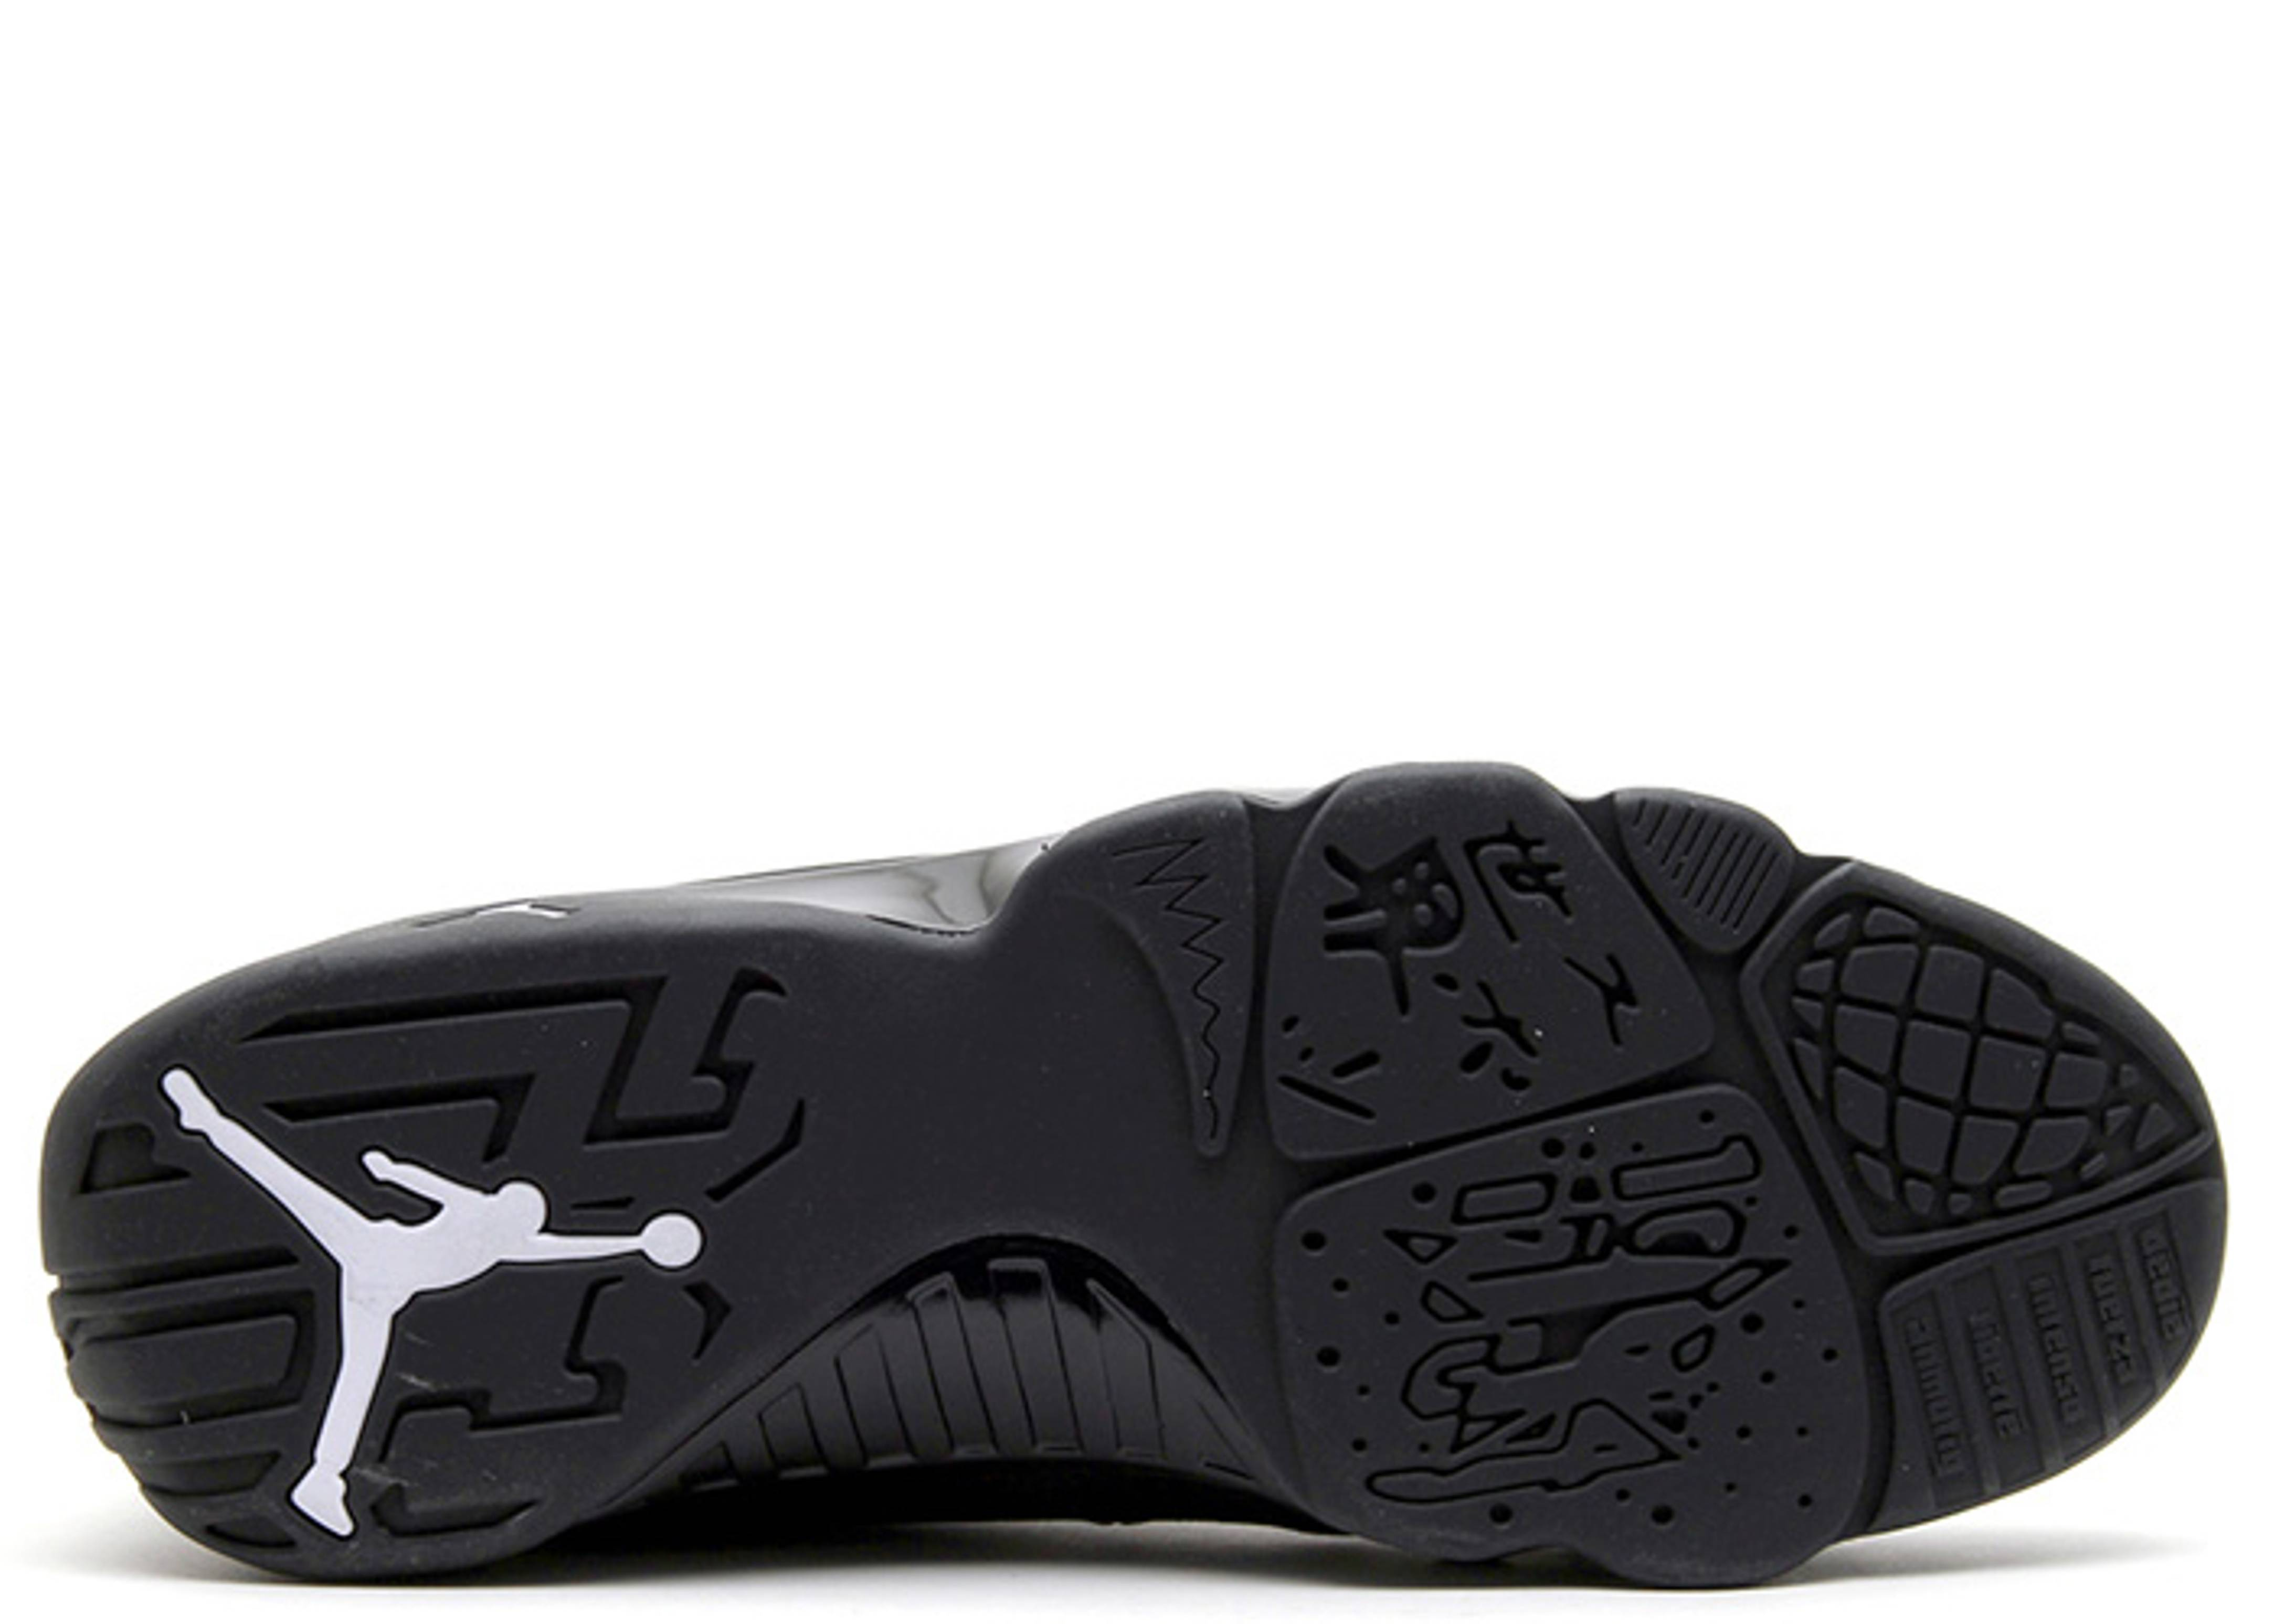 black and white jordan 9s